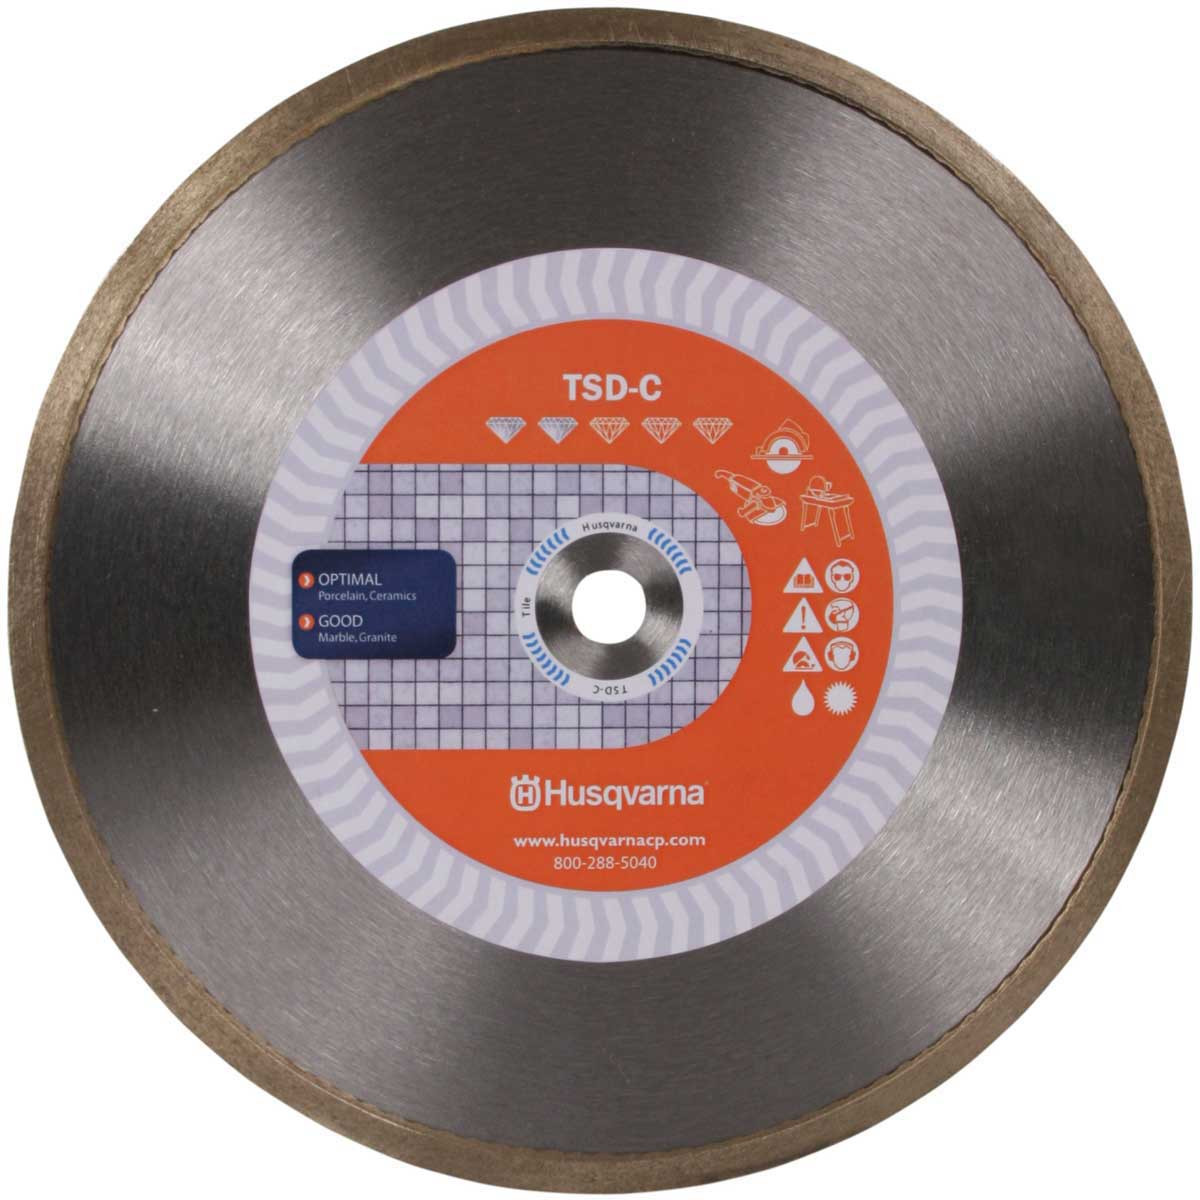 husqvarna tsd 4in continuous rim tile blade